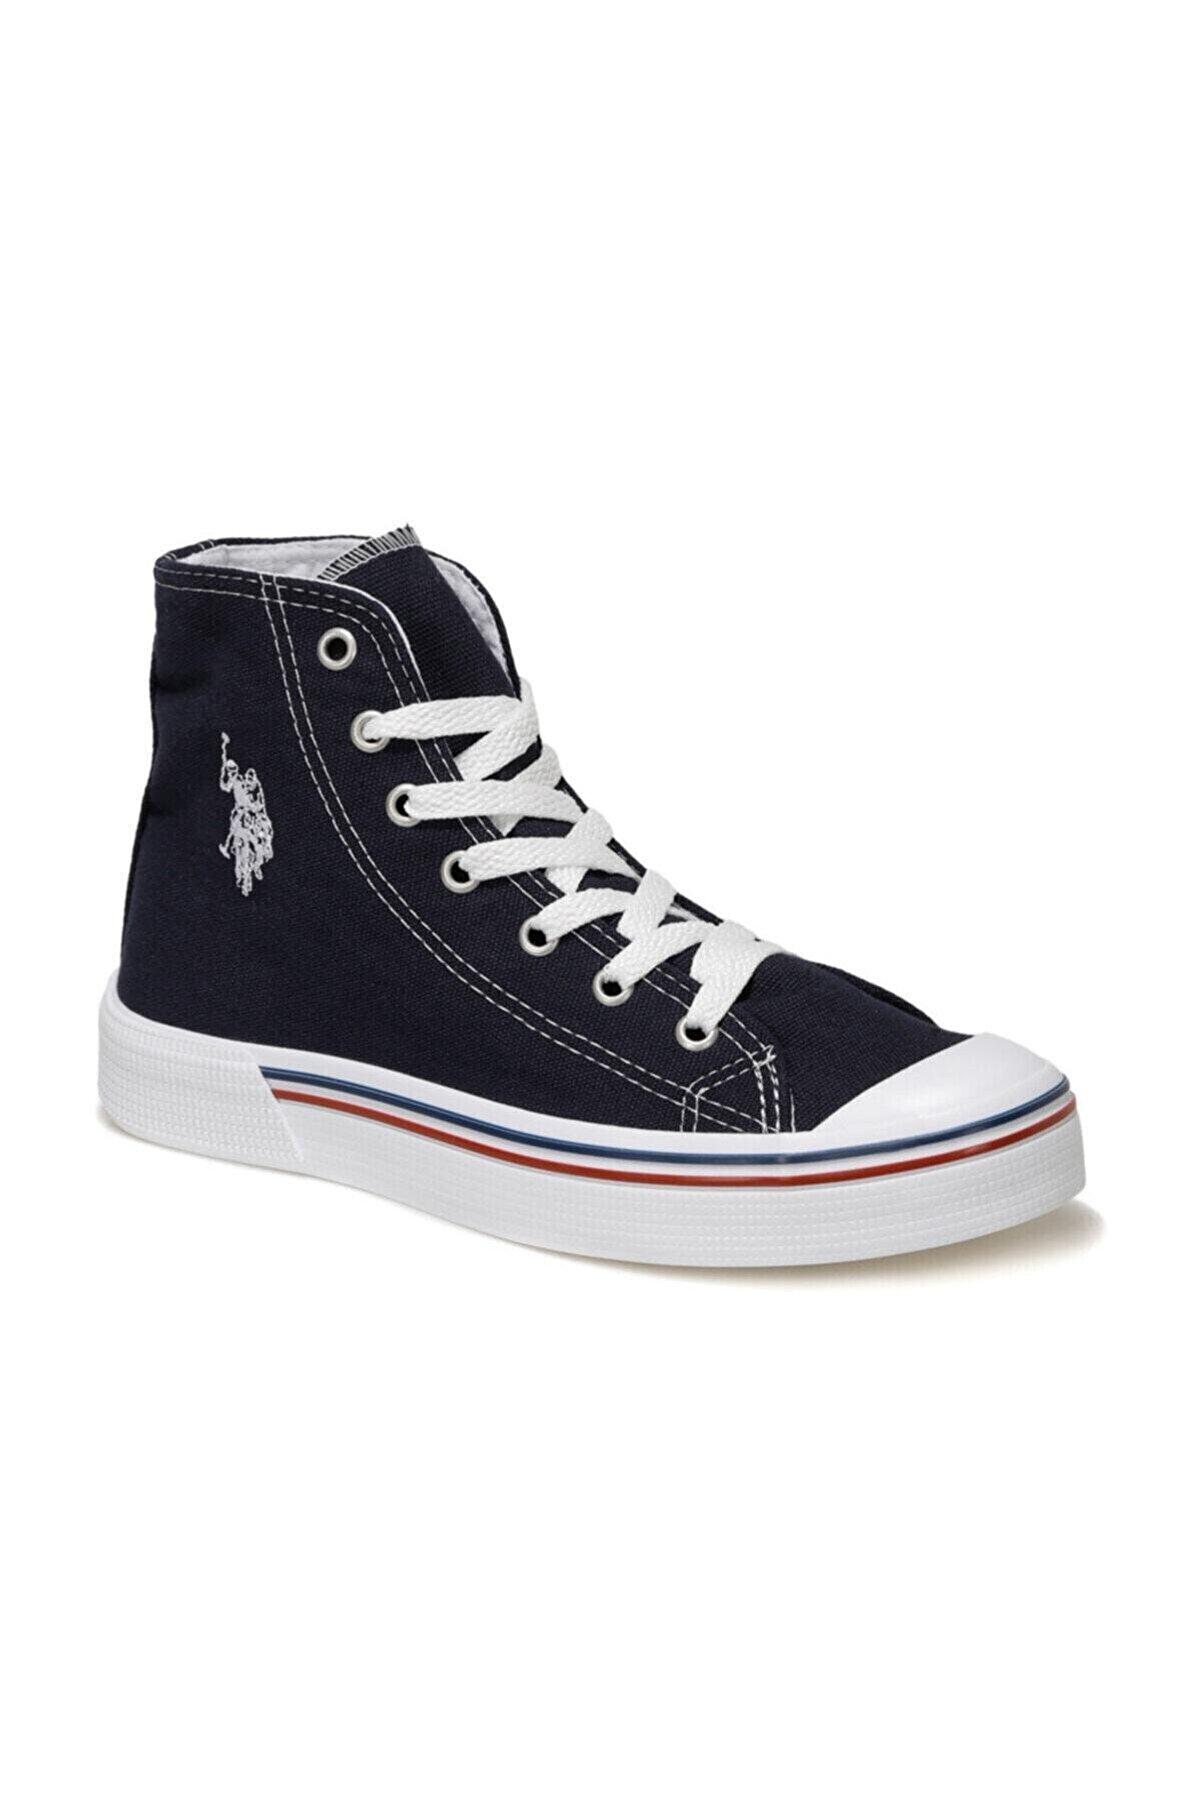 US Polo Assn PENELOPE HIGH 1FX Lacivert Kadın Havuz Taban Sneaker 100910635